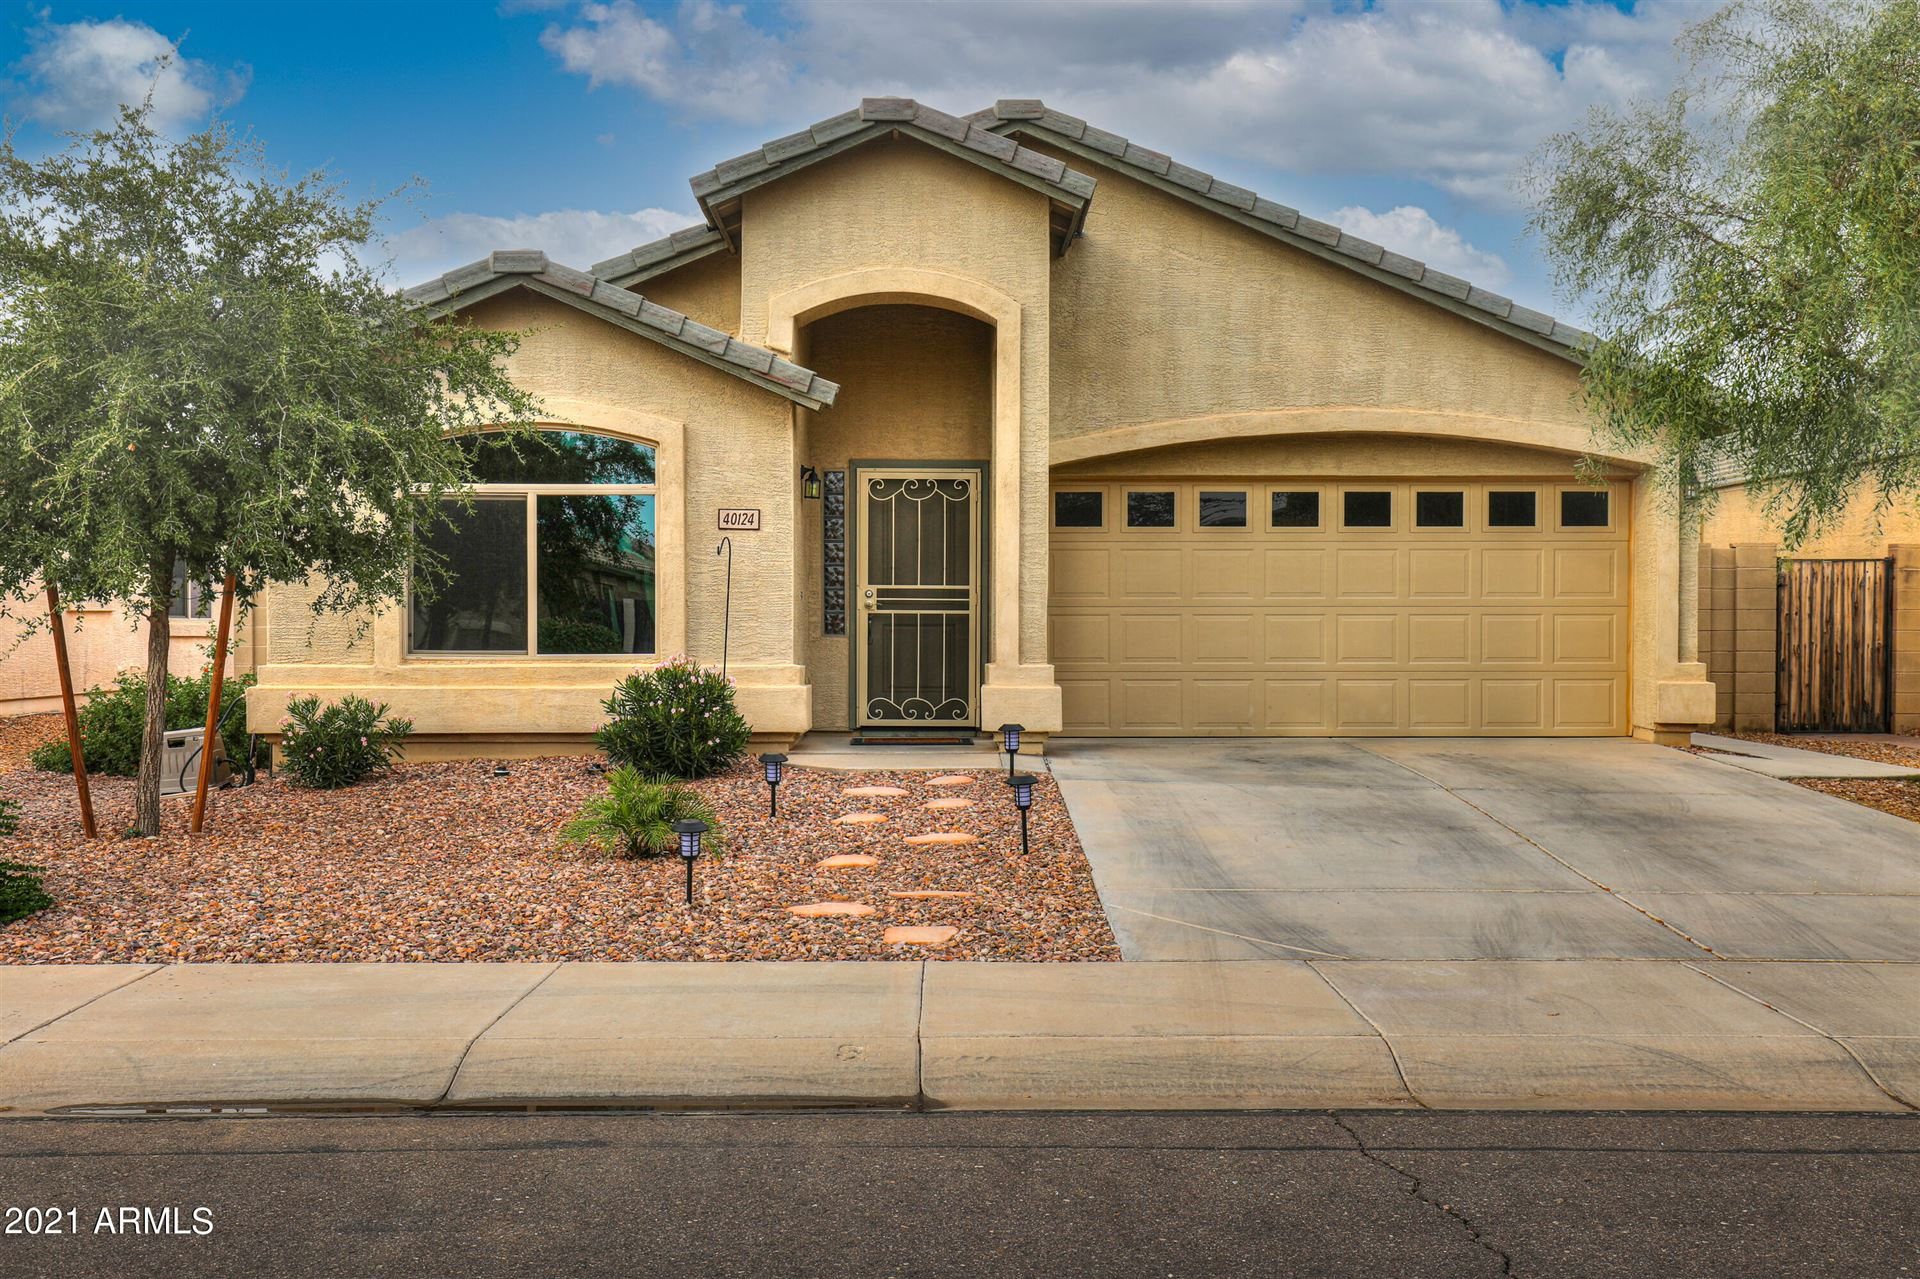 Photo of 40124 W NOVAK Lane, Maricopa, AZ 85138 (MLS # 6285270)